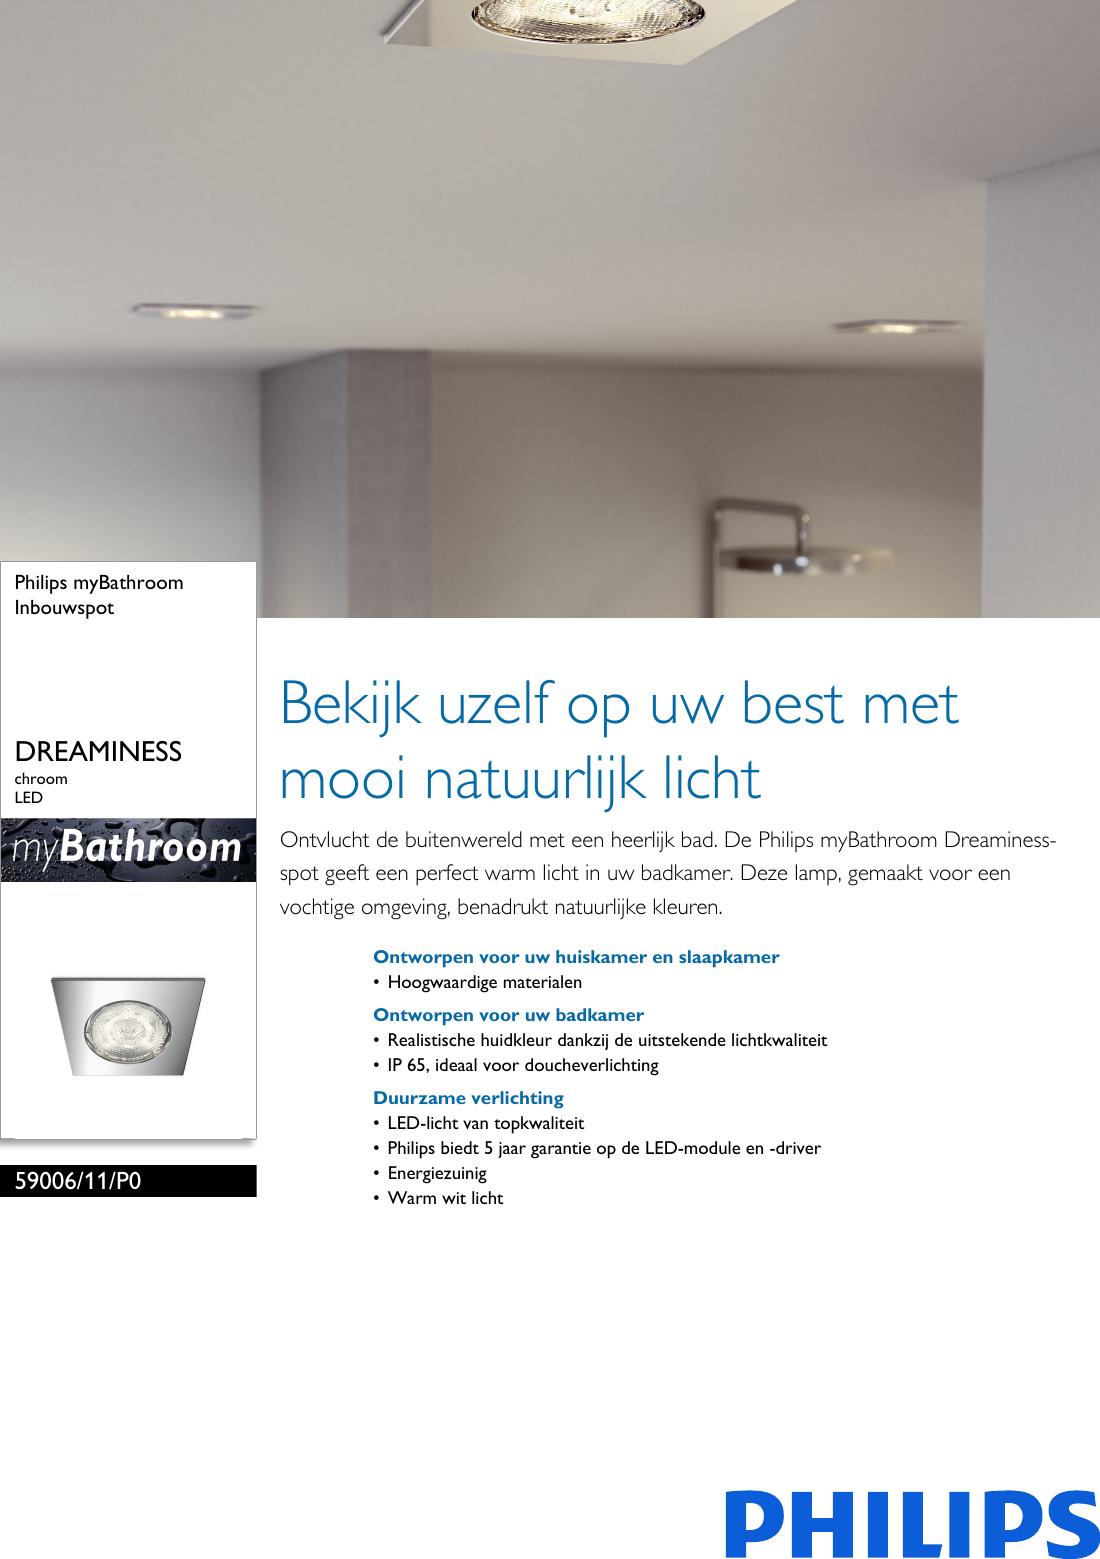 philips 59006 11 p0 5900611p0 inbouwspot user manual. Black Bedroom Furniture Sets. Home Design Ideas